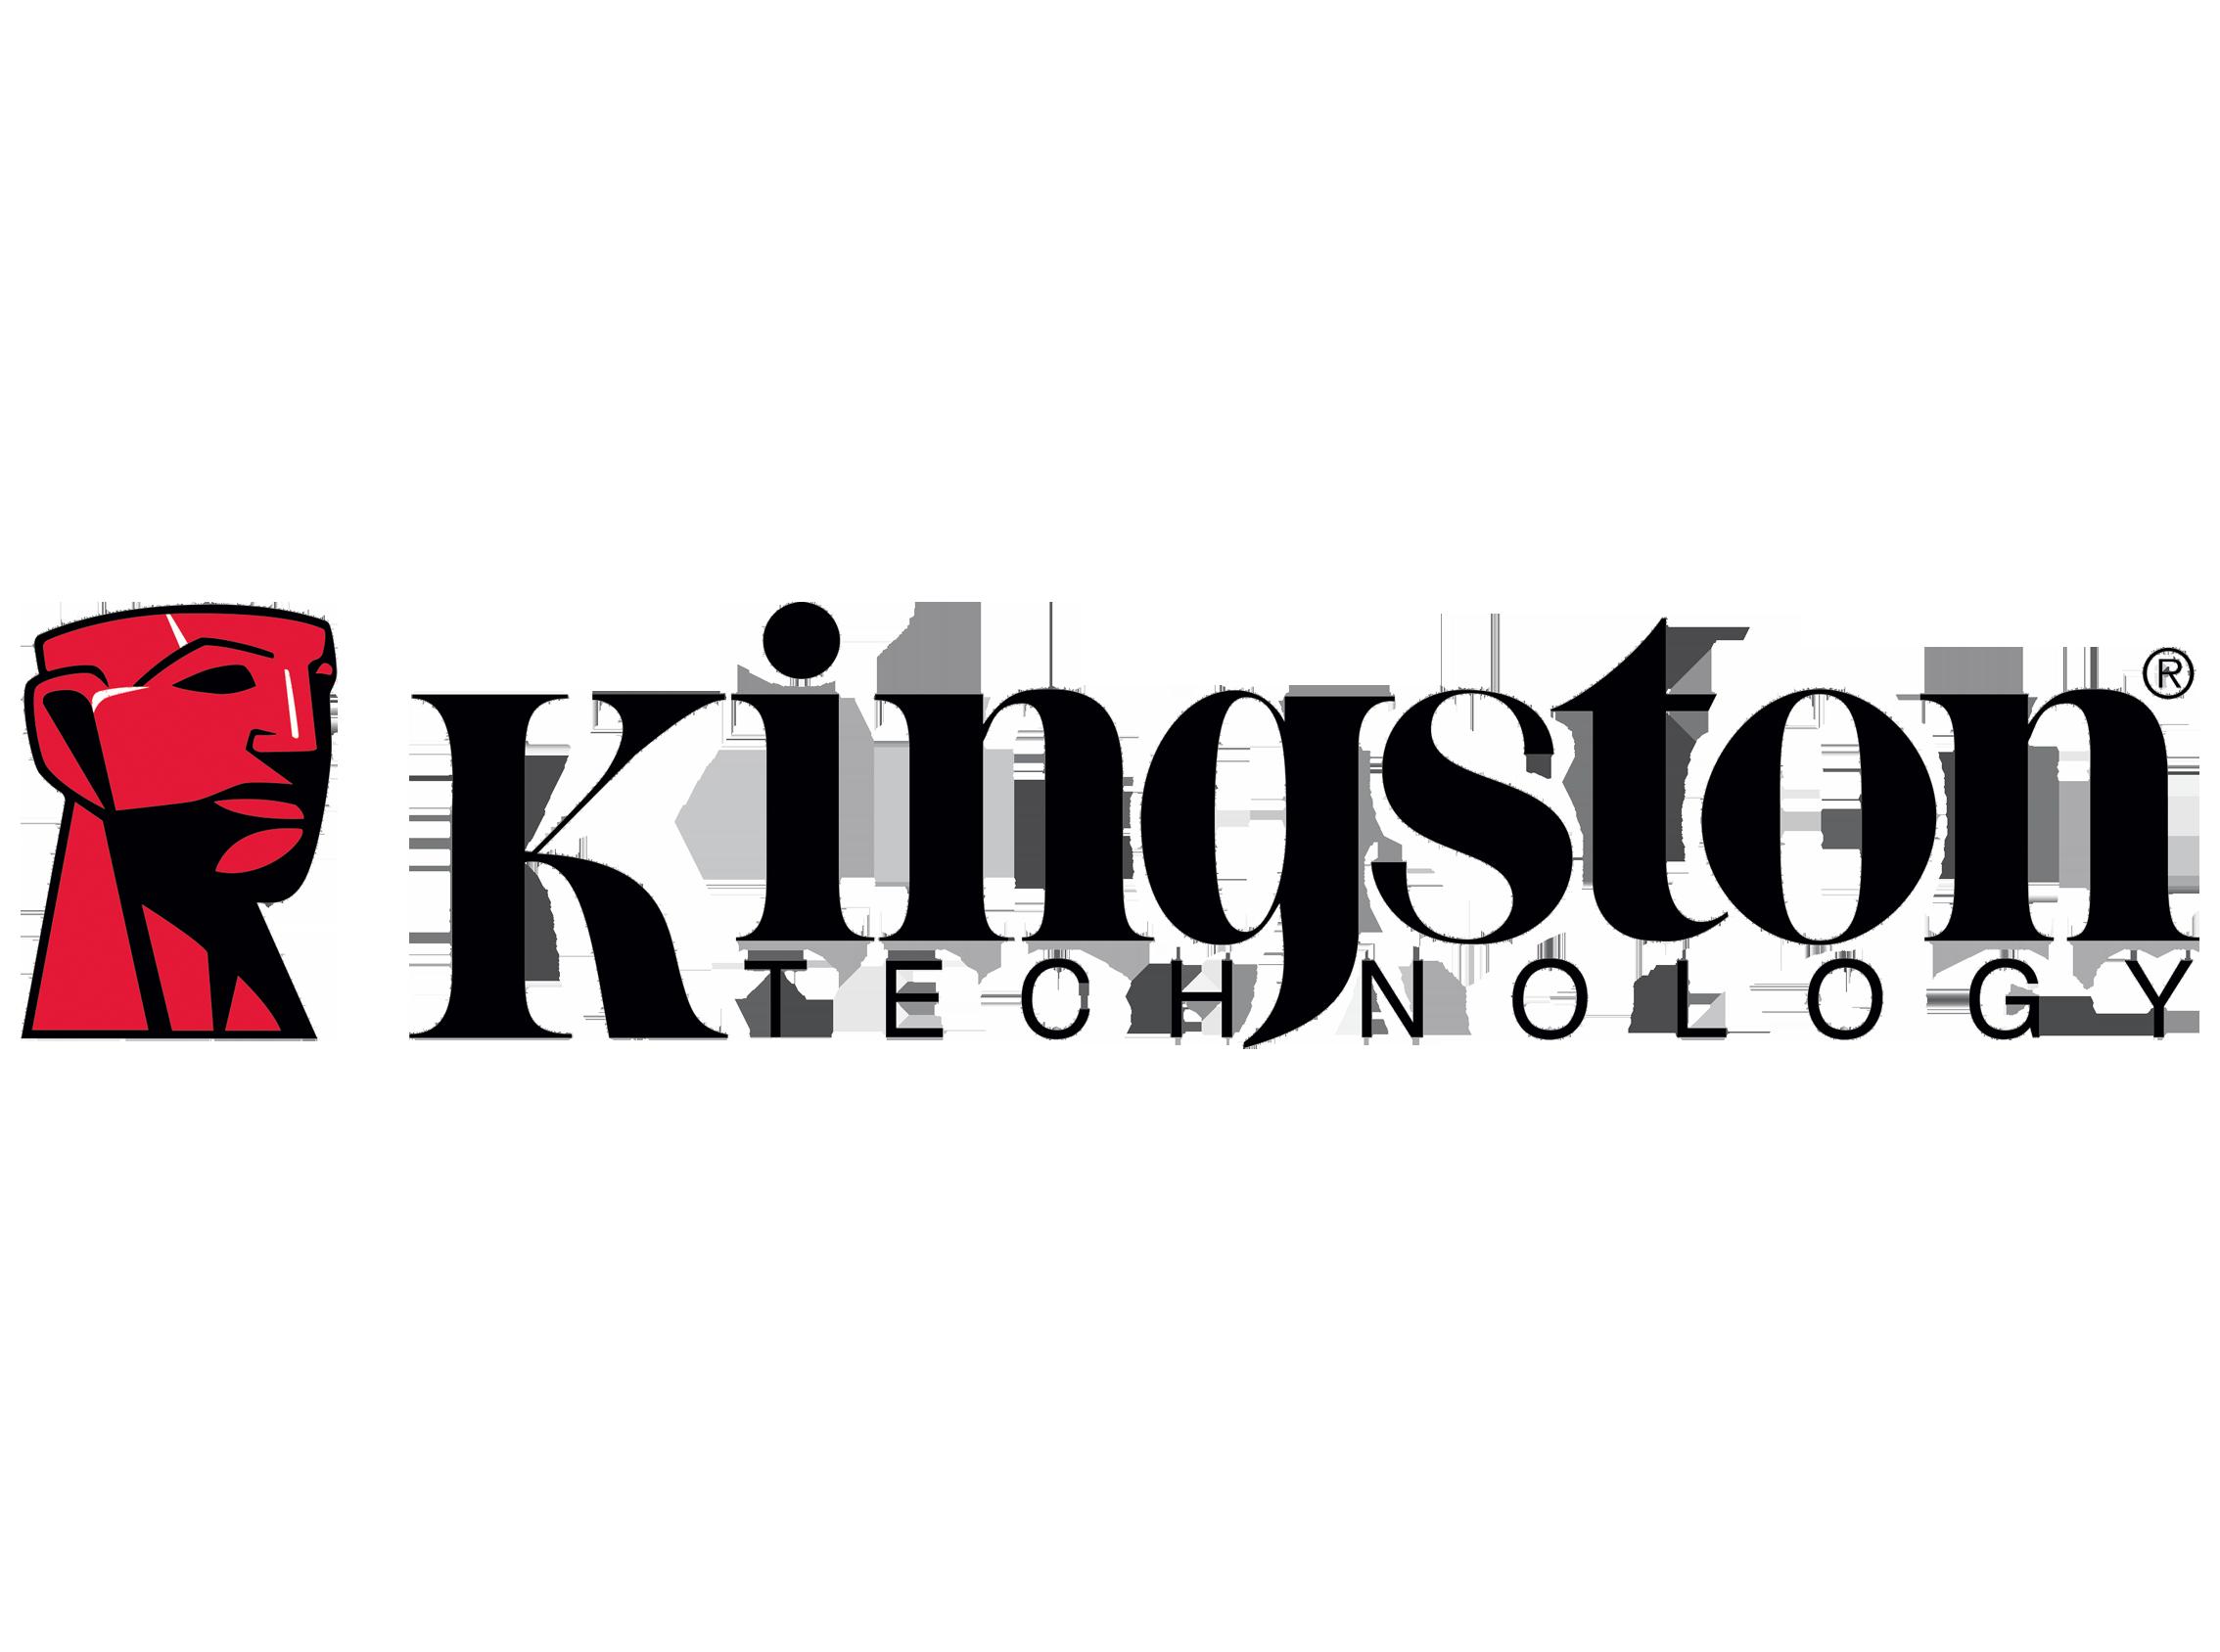 Kingston logo wordmark